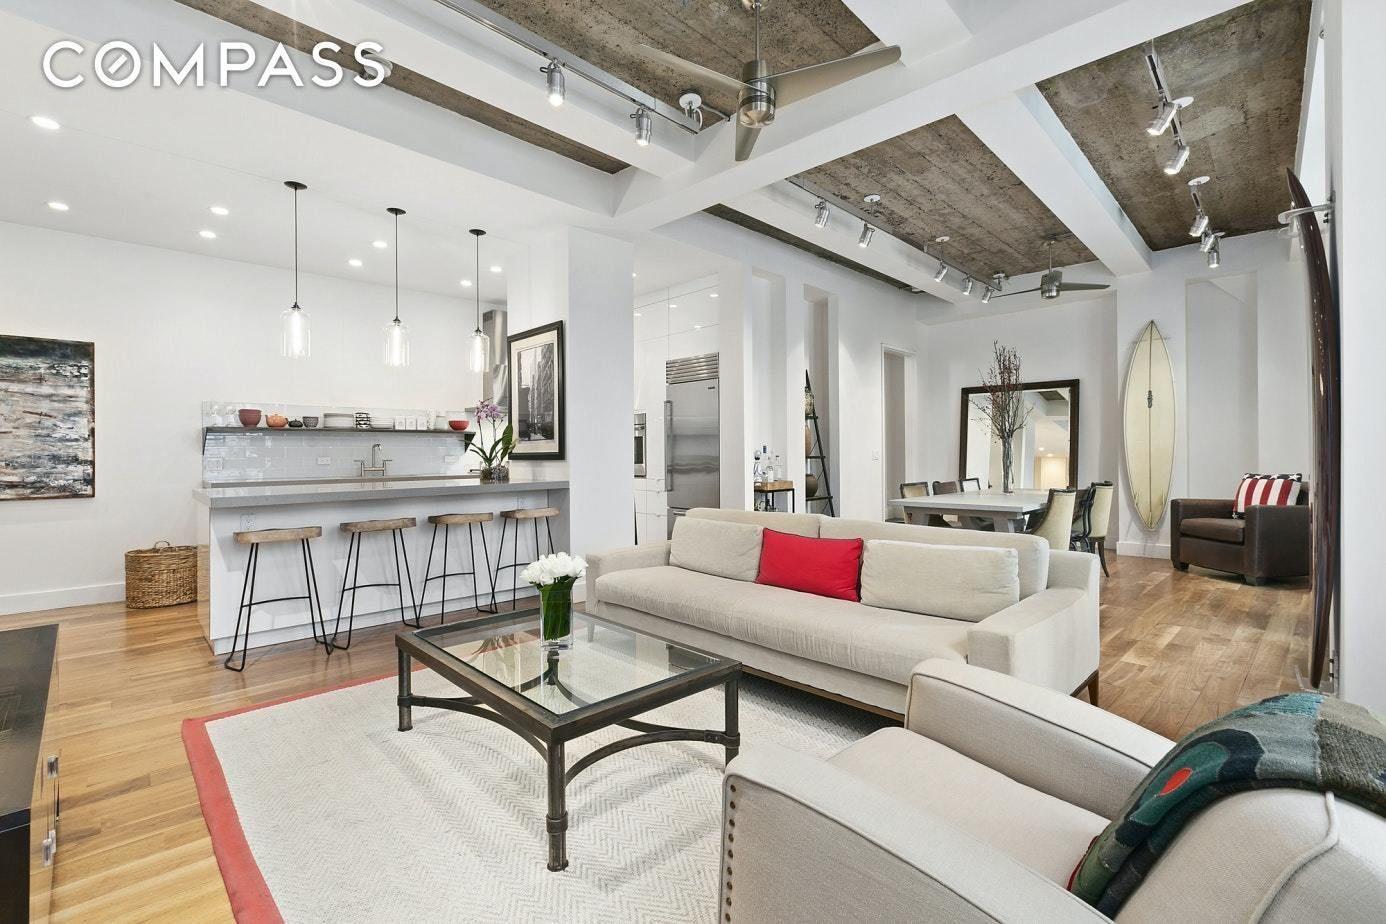 Apartment for sale at 26 Beaver Street, Apt 6-B